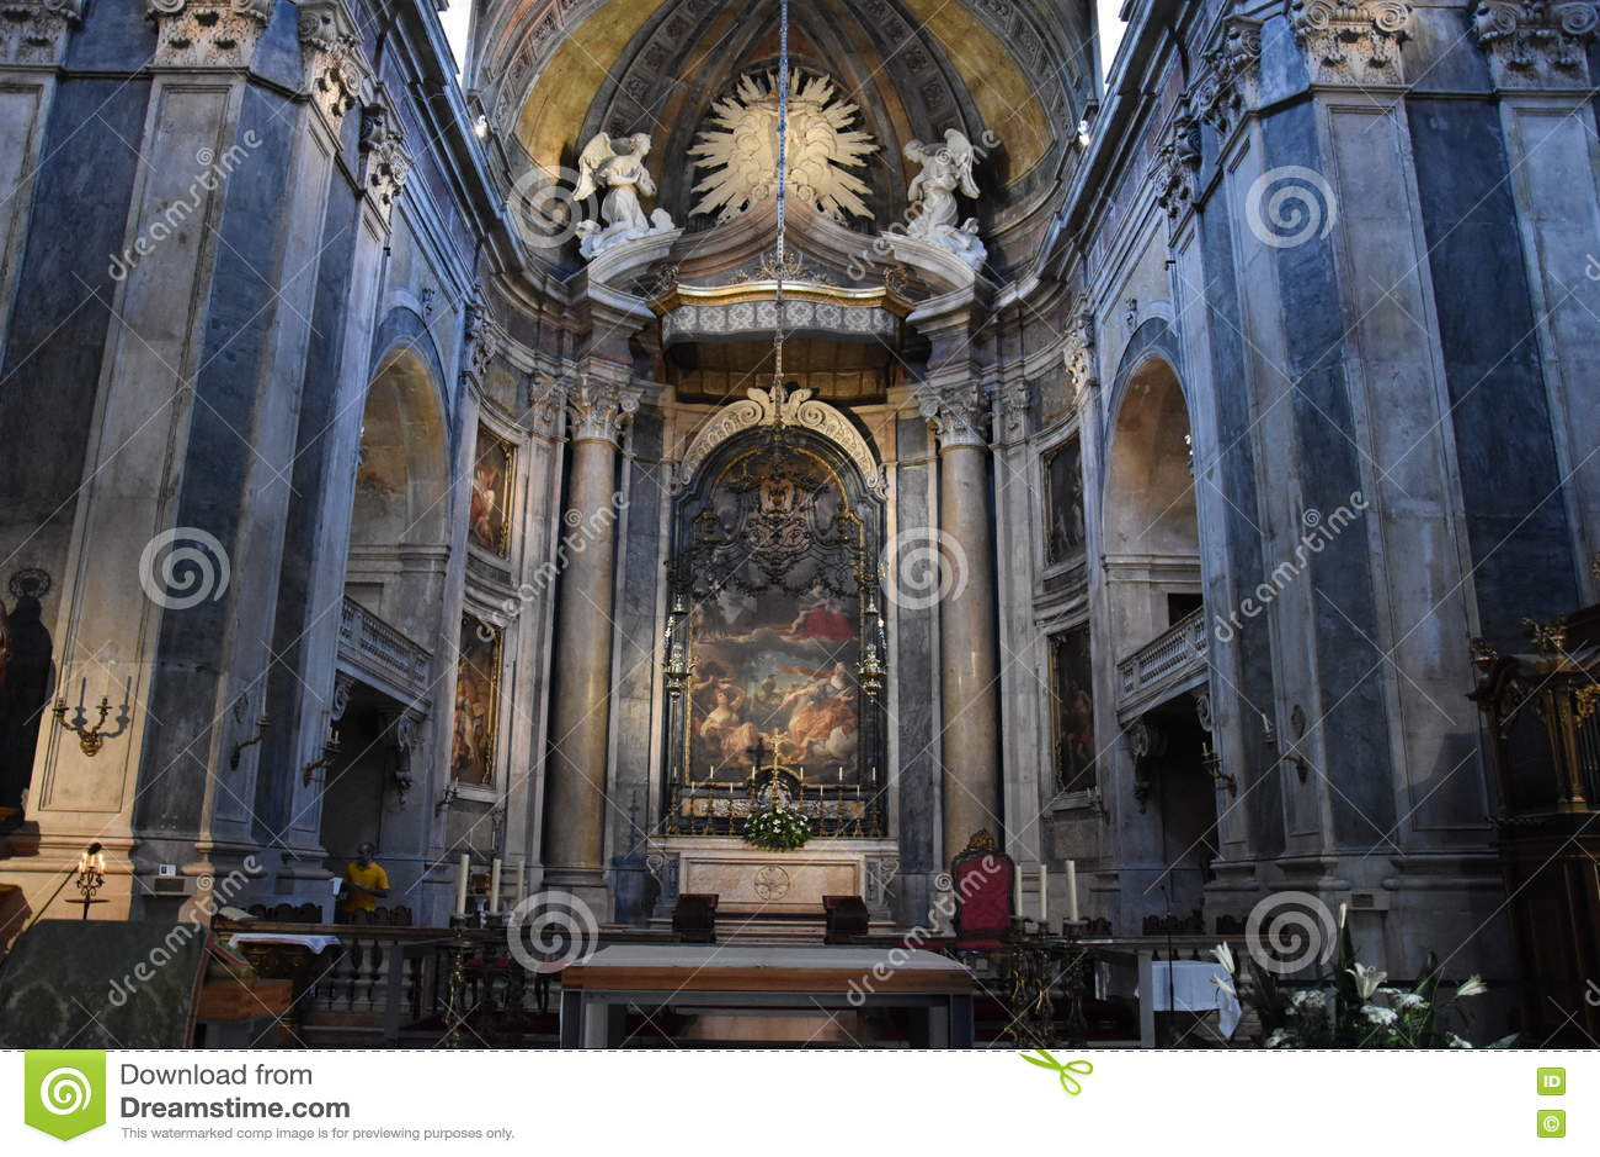 Estrela大教堂在里斯本,葡萄牙